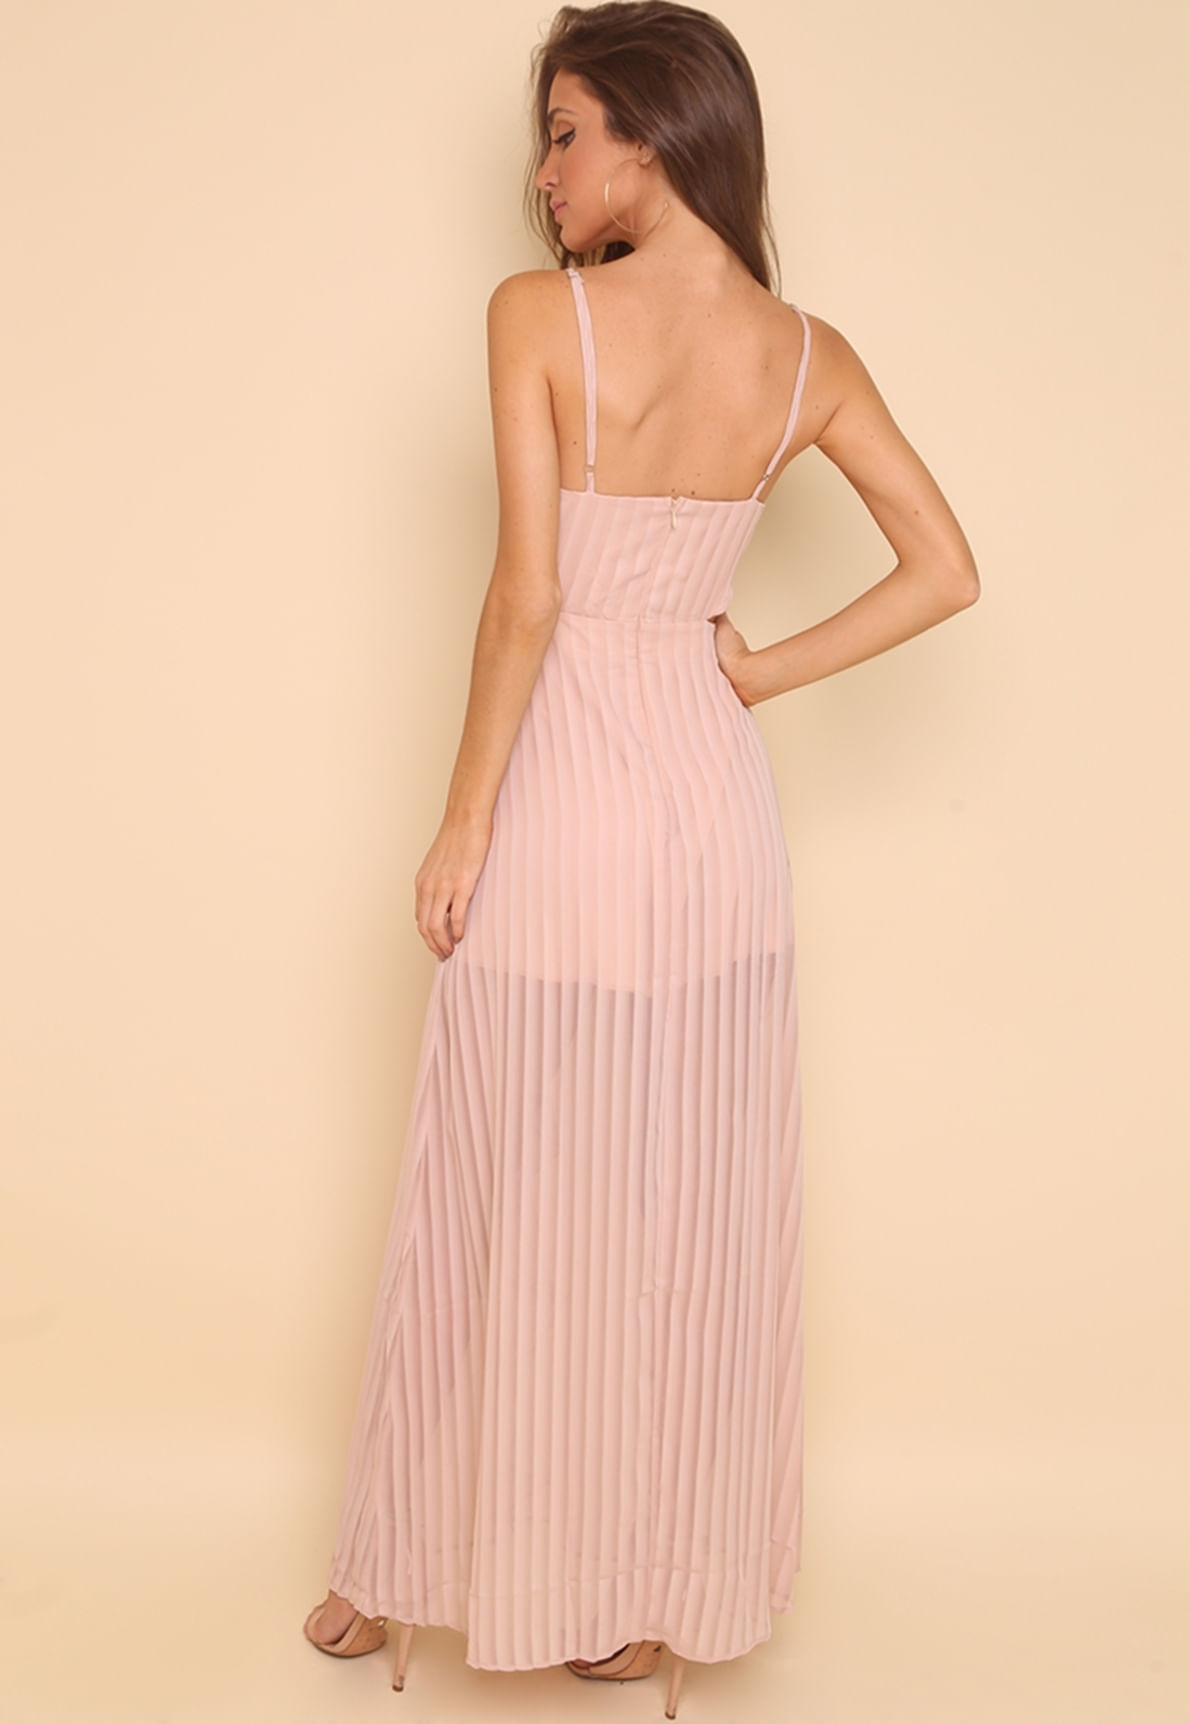 29787-vestido-longo-recortes-nana-mundo-lolita-04.jpg